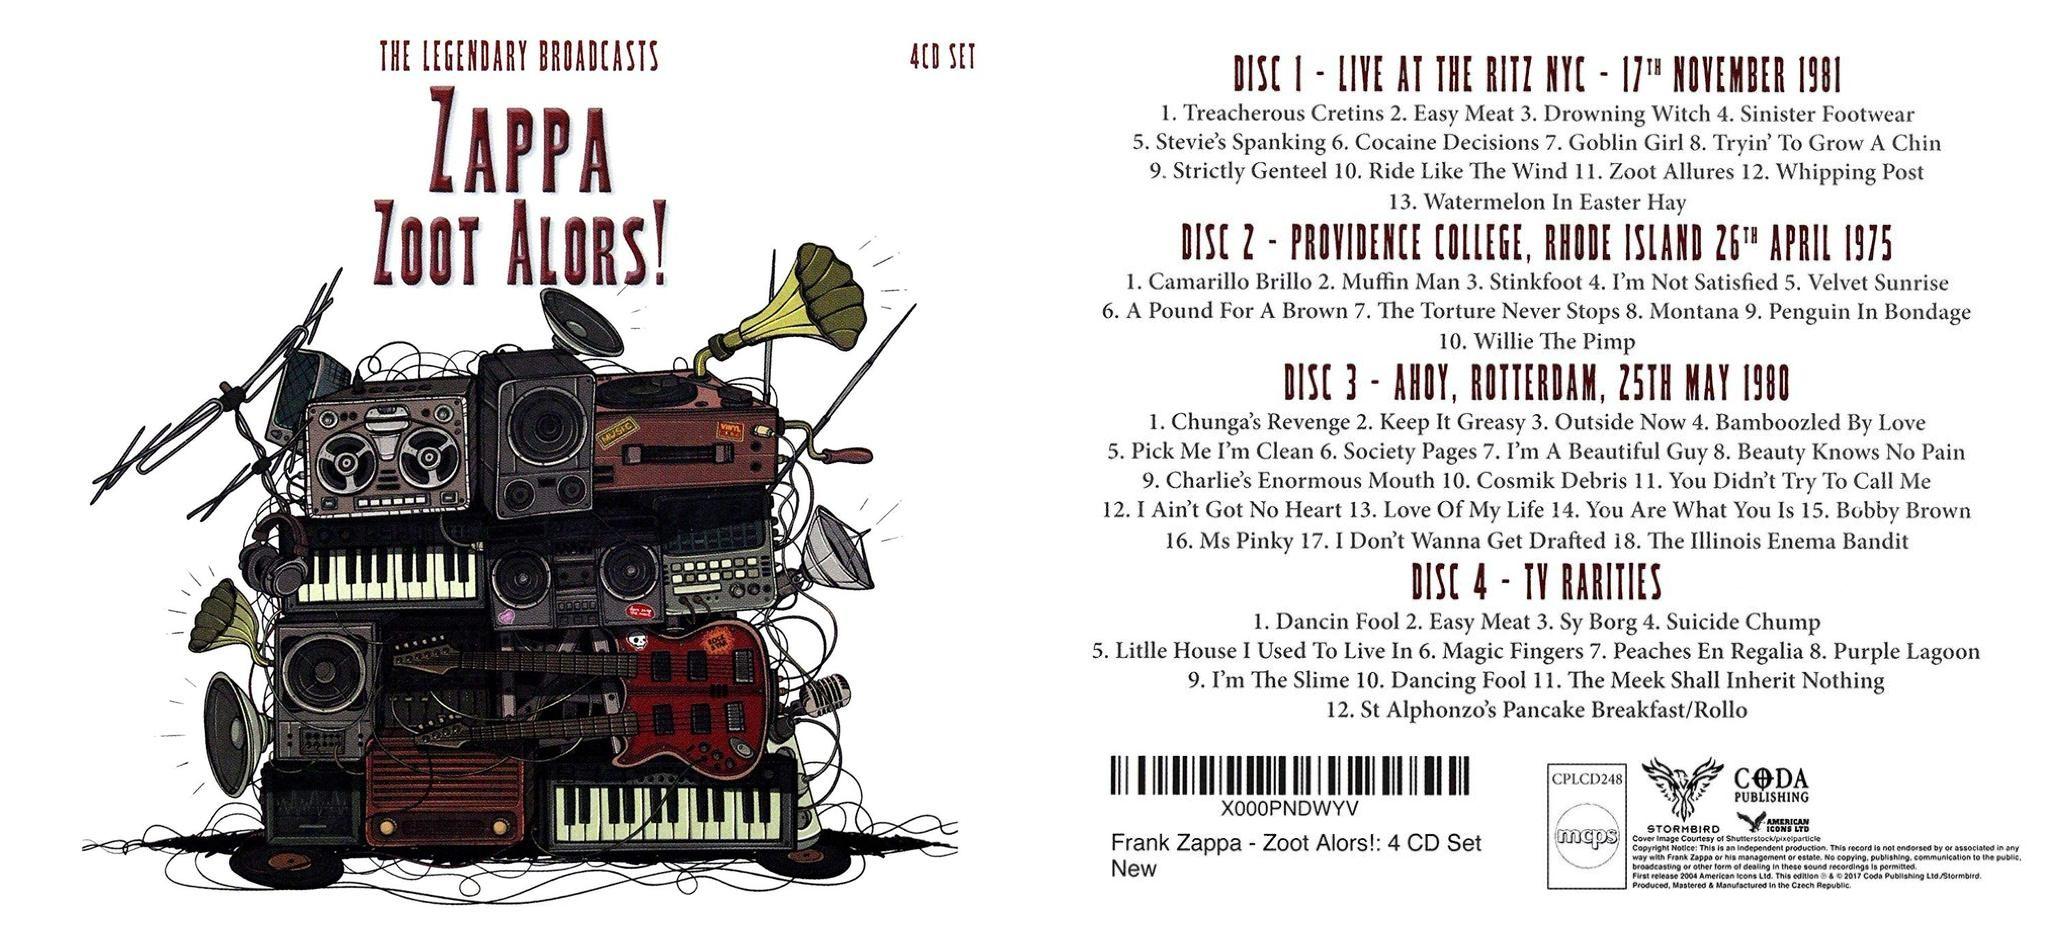 zappa, frank zoot alors! the legendary broadcasts: 4cd set (live at the ritz nyc 17th november 1981, providence c